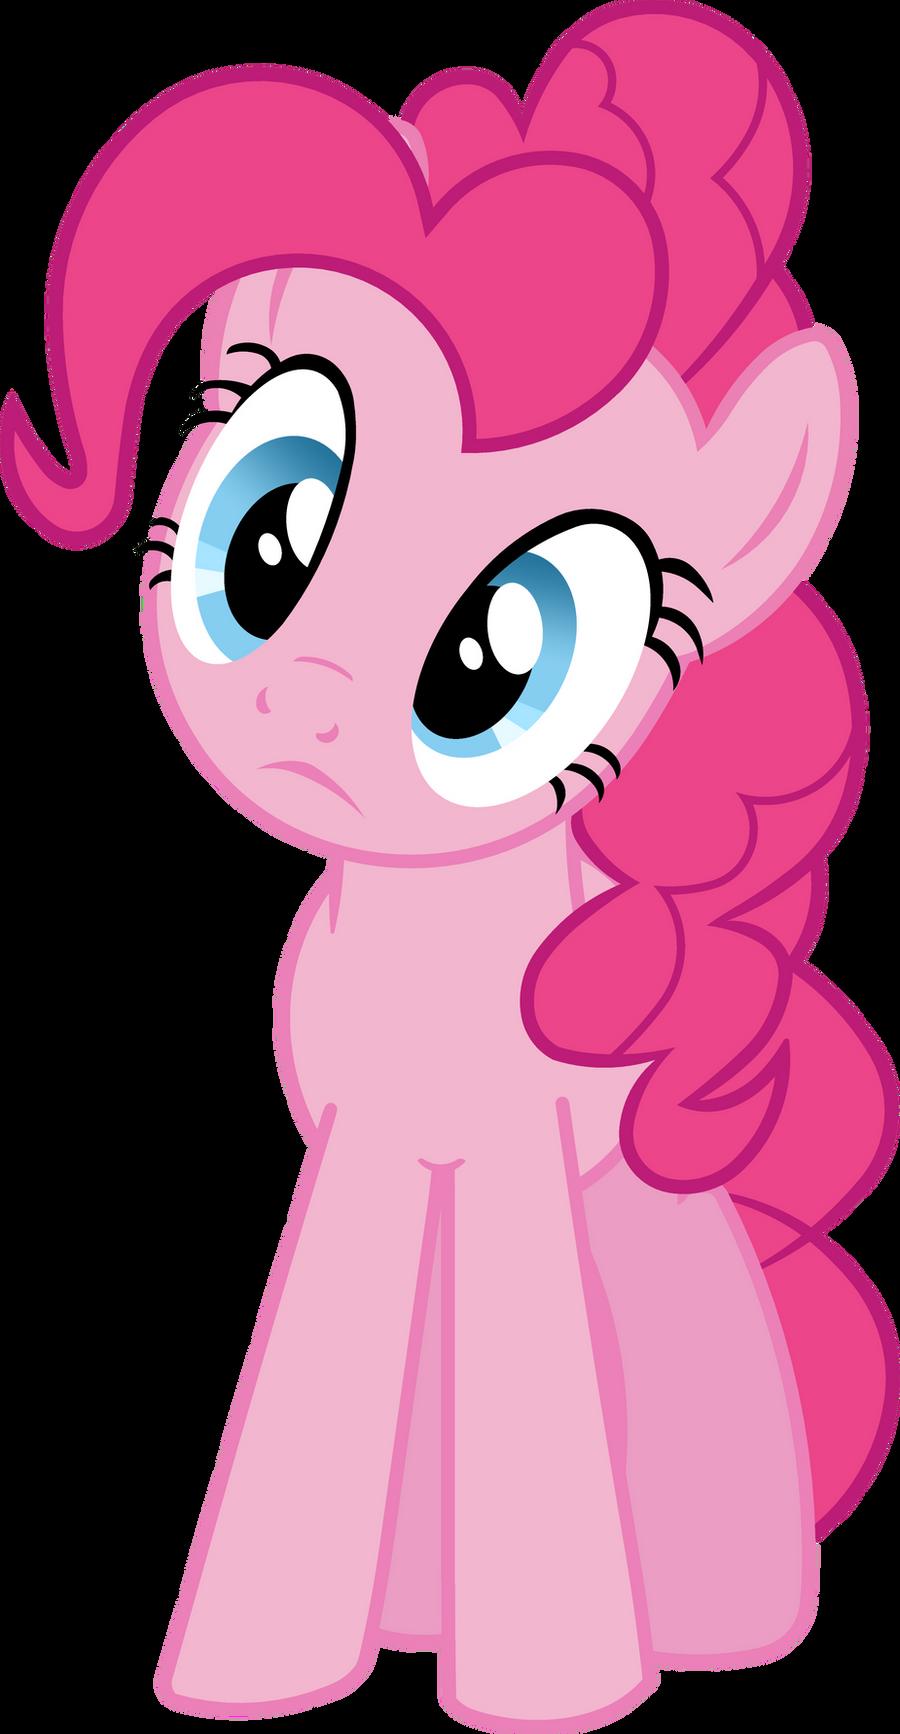 Pinkie Pie - Head-tilted perplexity by BobtheLurker